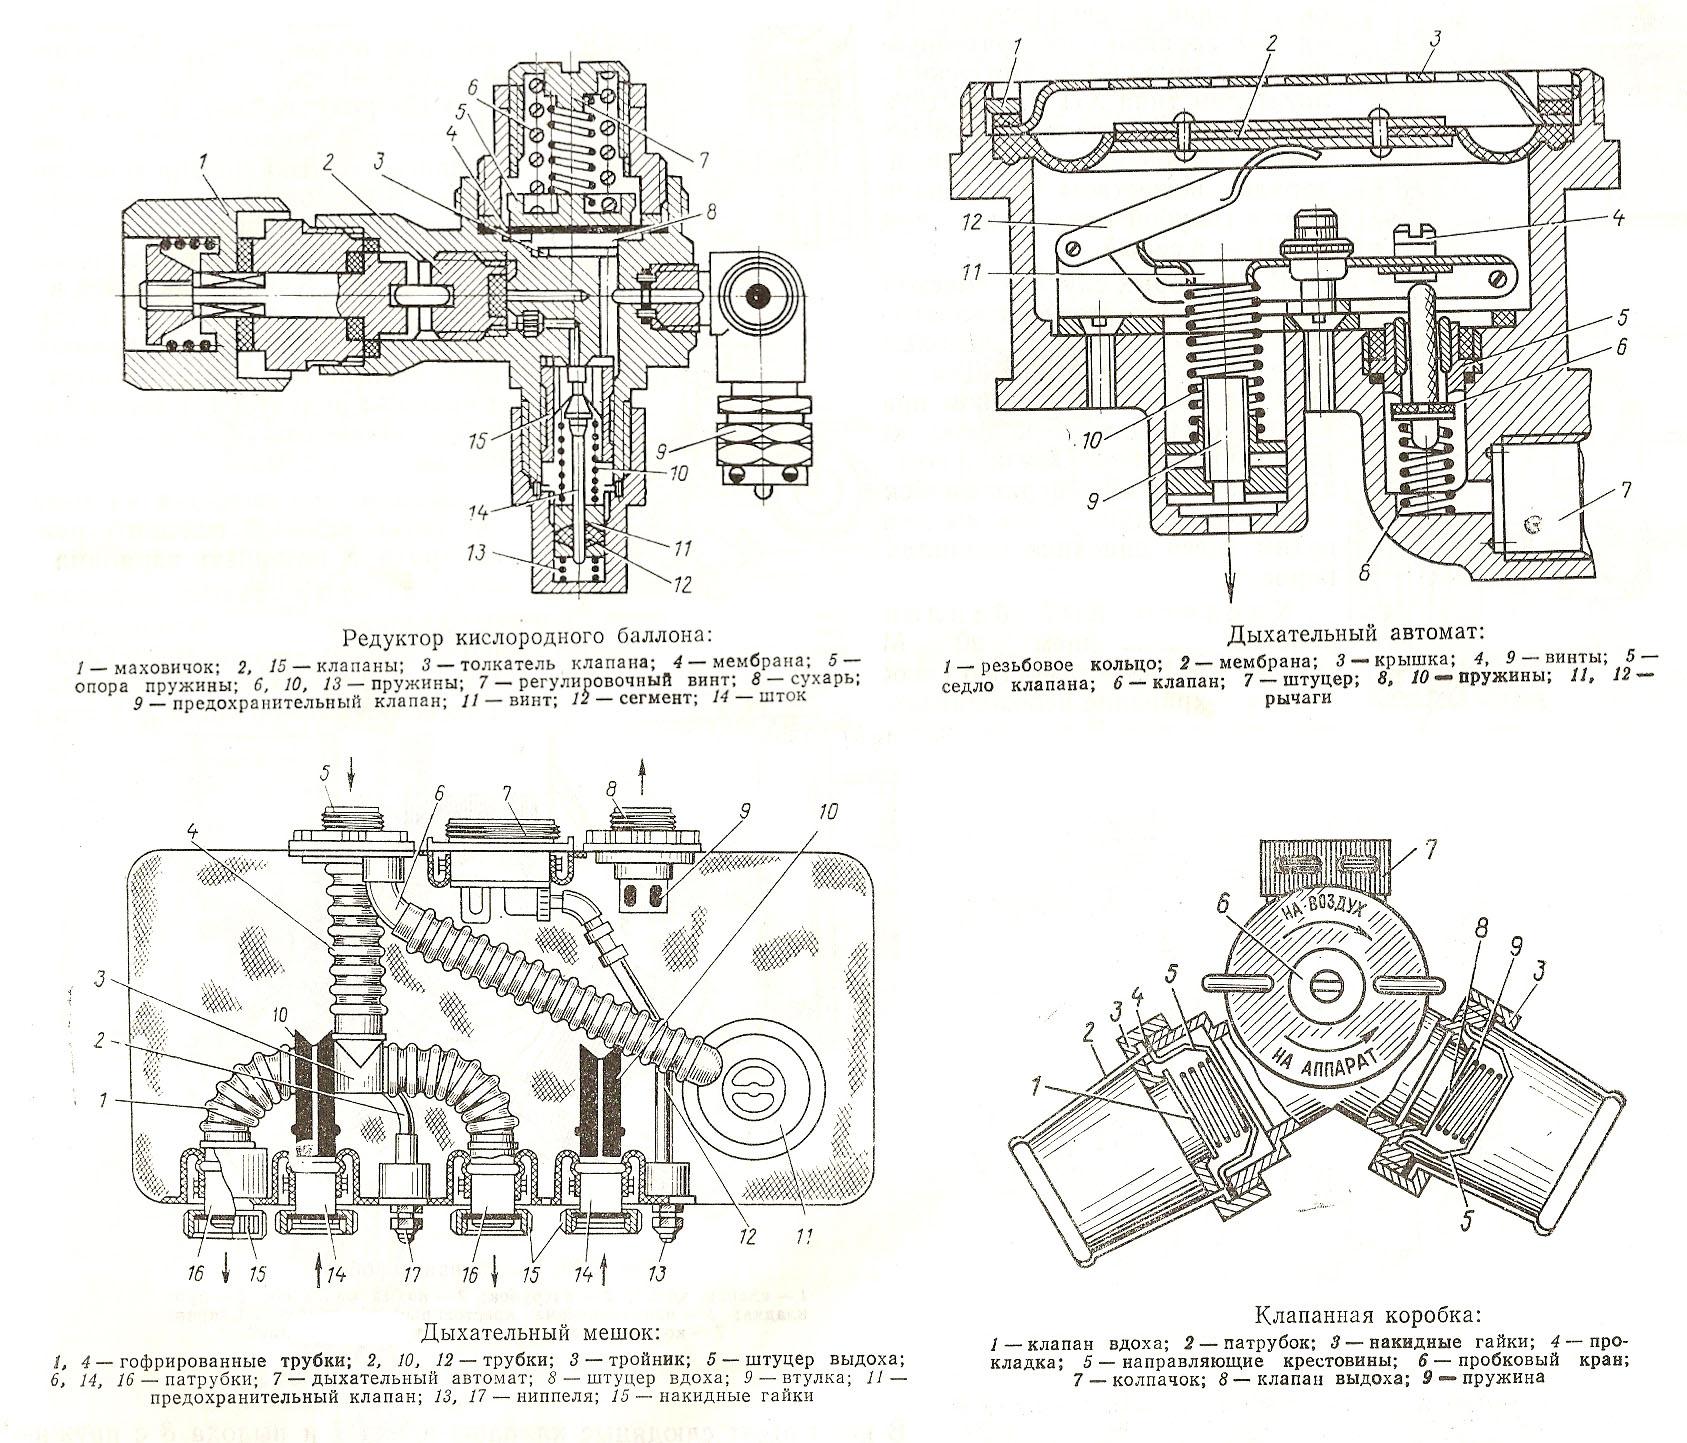 Схема действия аппарата ИДА-71У на глубинах от 20 до 40 м. Увеличить